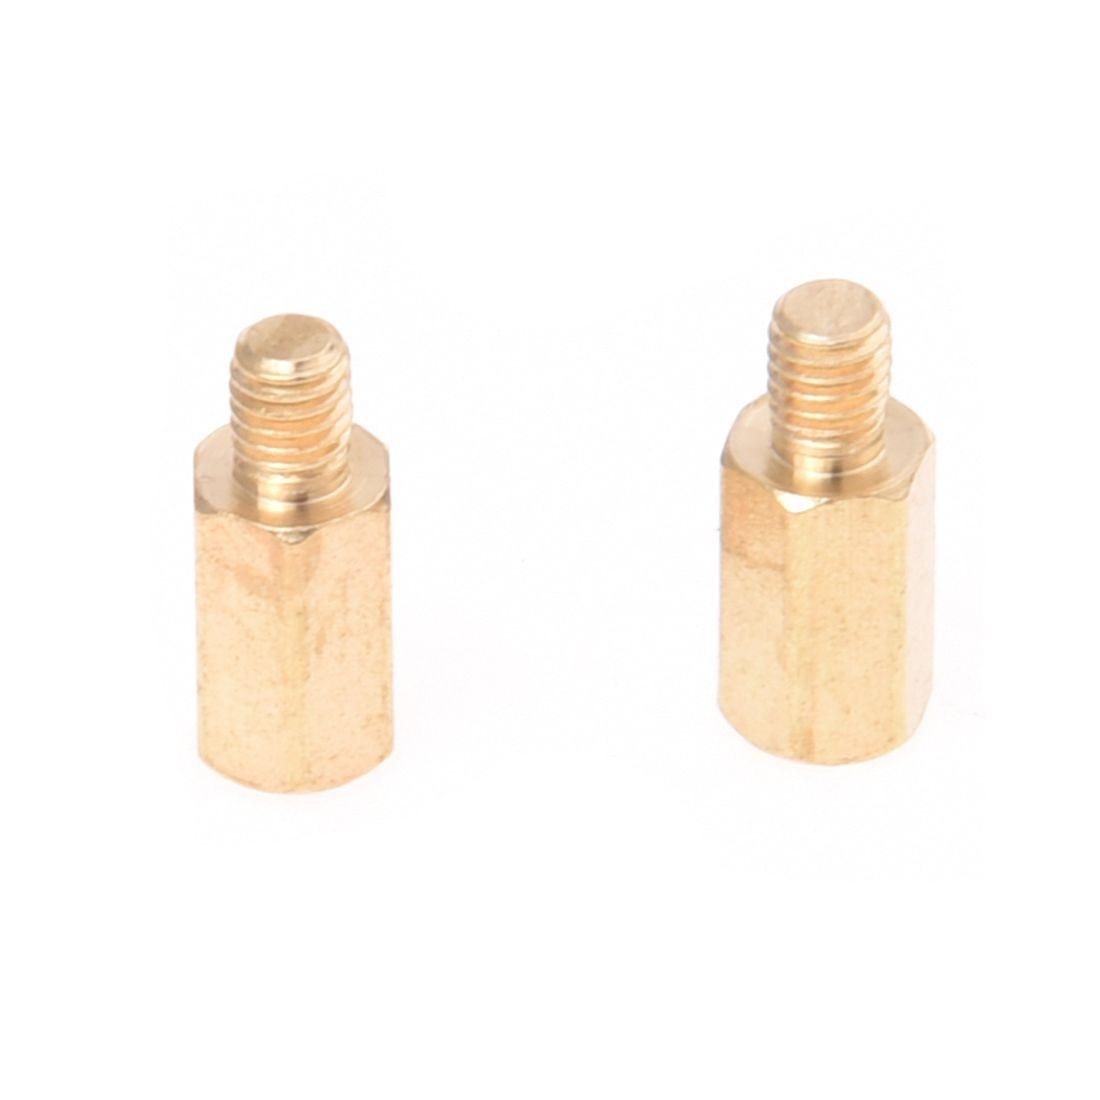 M5-5mm HEX NUT BRASS METRIC HEXAGONAL FULL NUTS DIN 934 FS1585